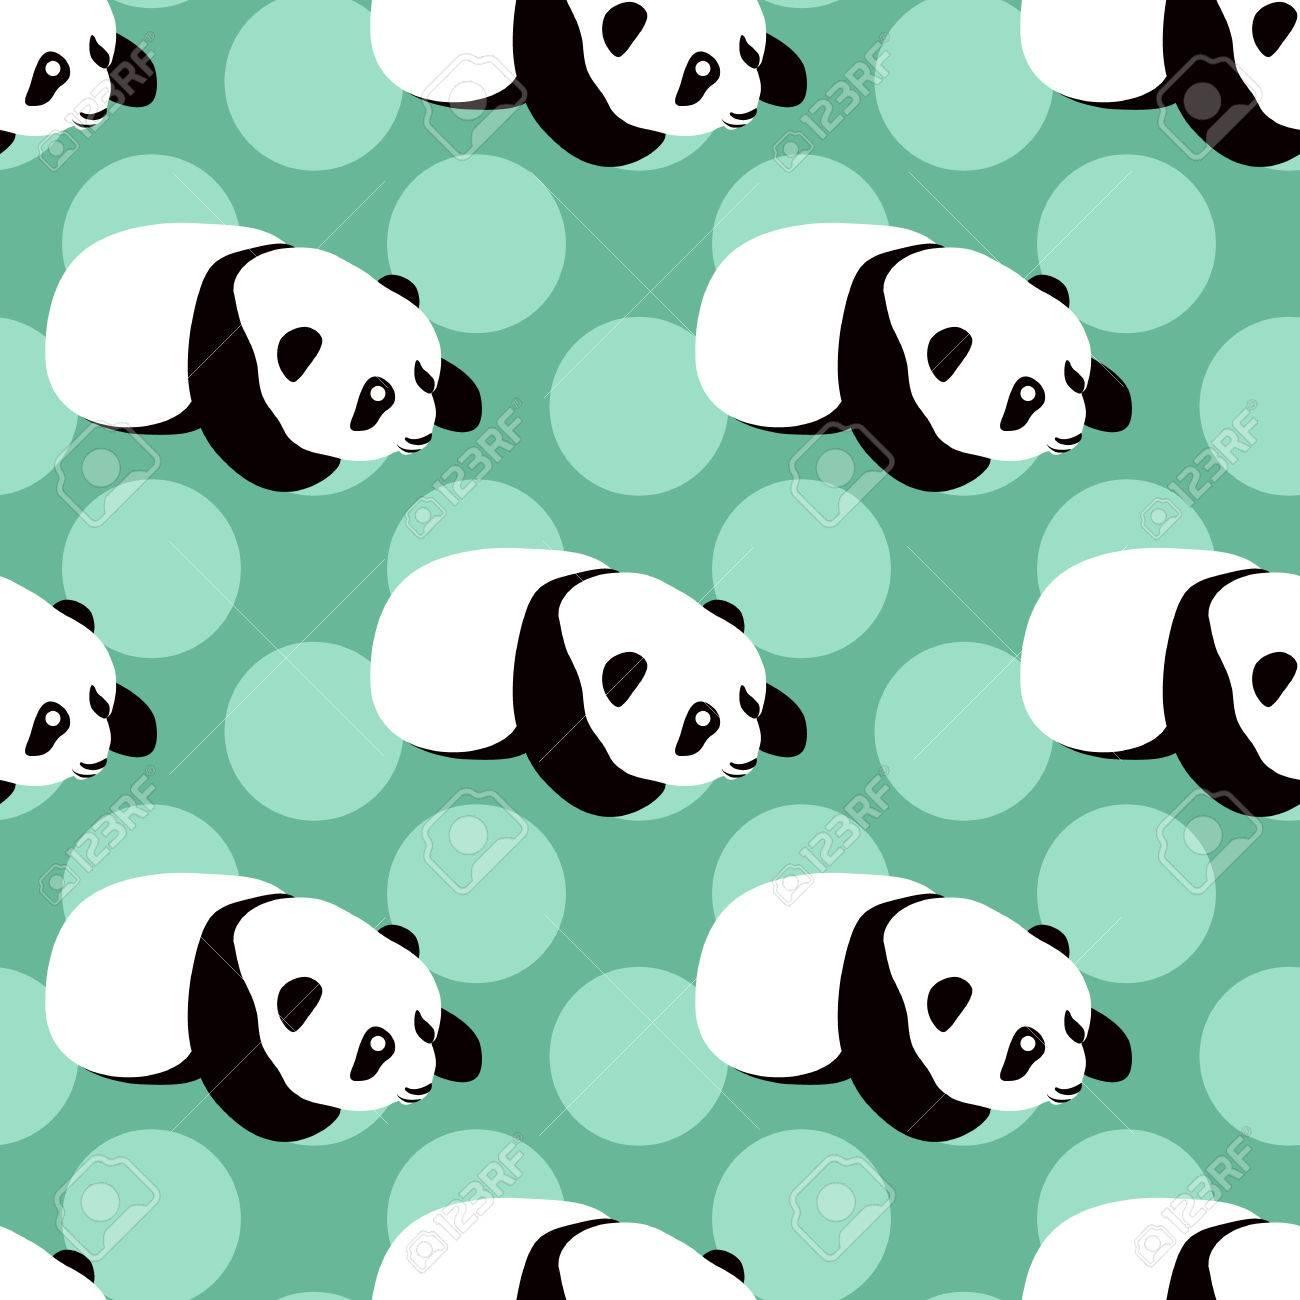 panda bear vector background seamless pattern with cute cartoon rh 123rf com Cute Cartoon Unicorns Cute Cartoon Pandas with Mustaches